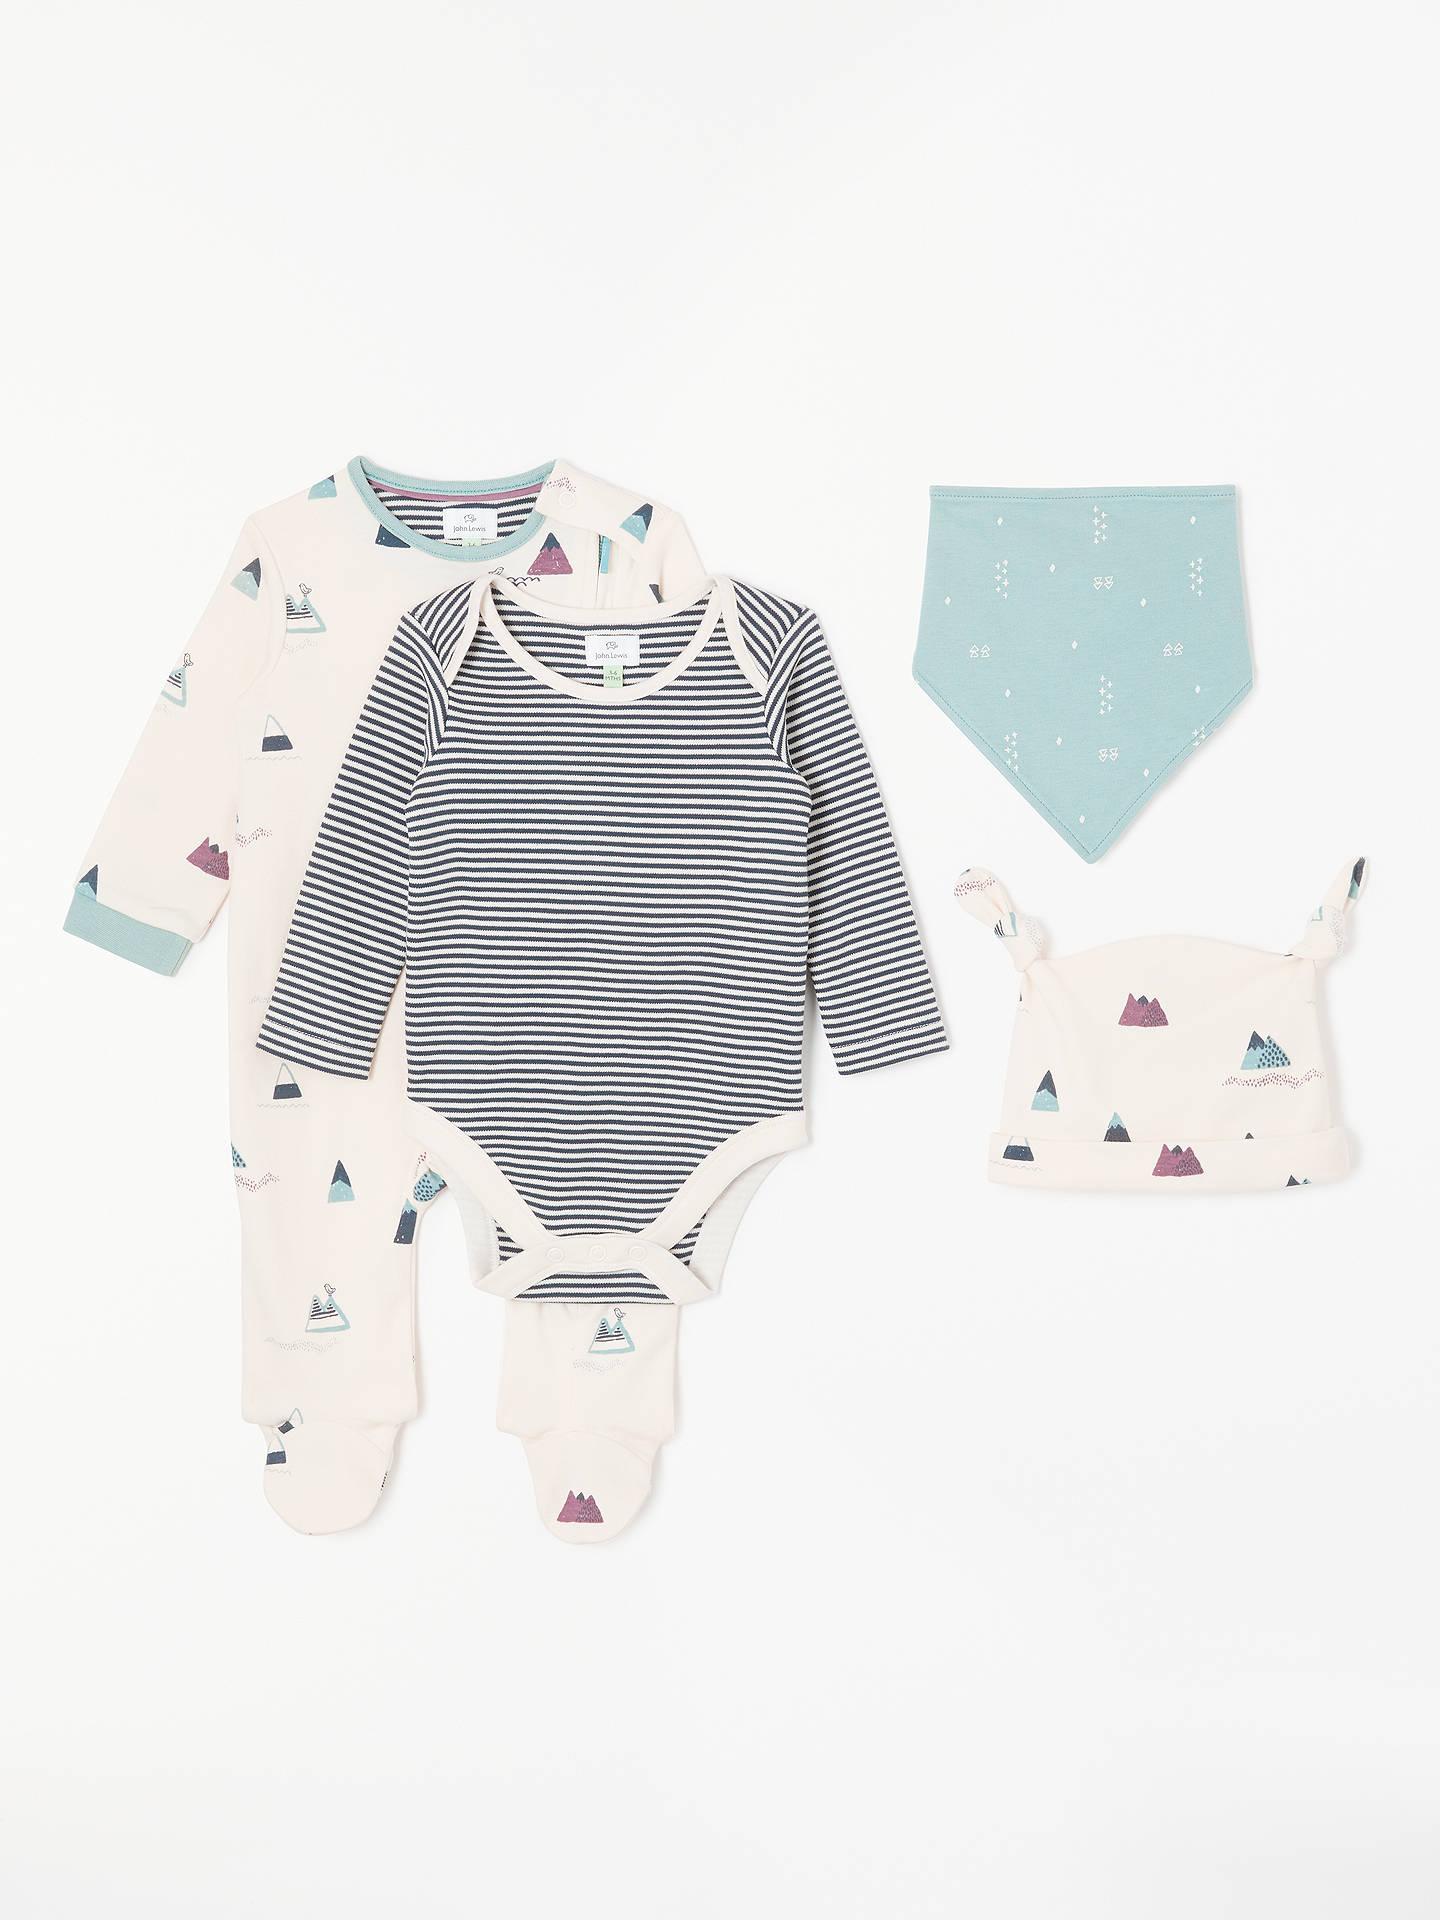 caab3fe6a63 John Lewis   Partners Baby GOTS Organic Cotton Magic Mountain Sleepsuit